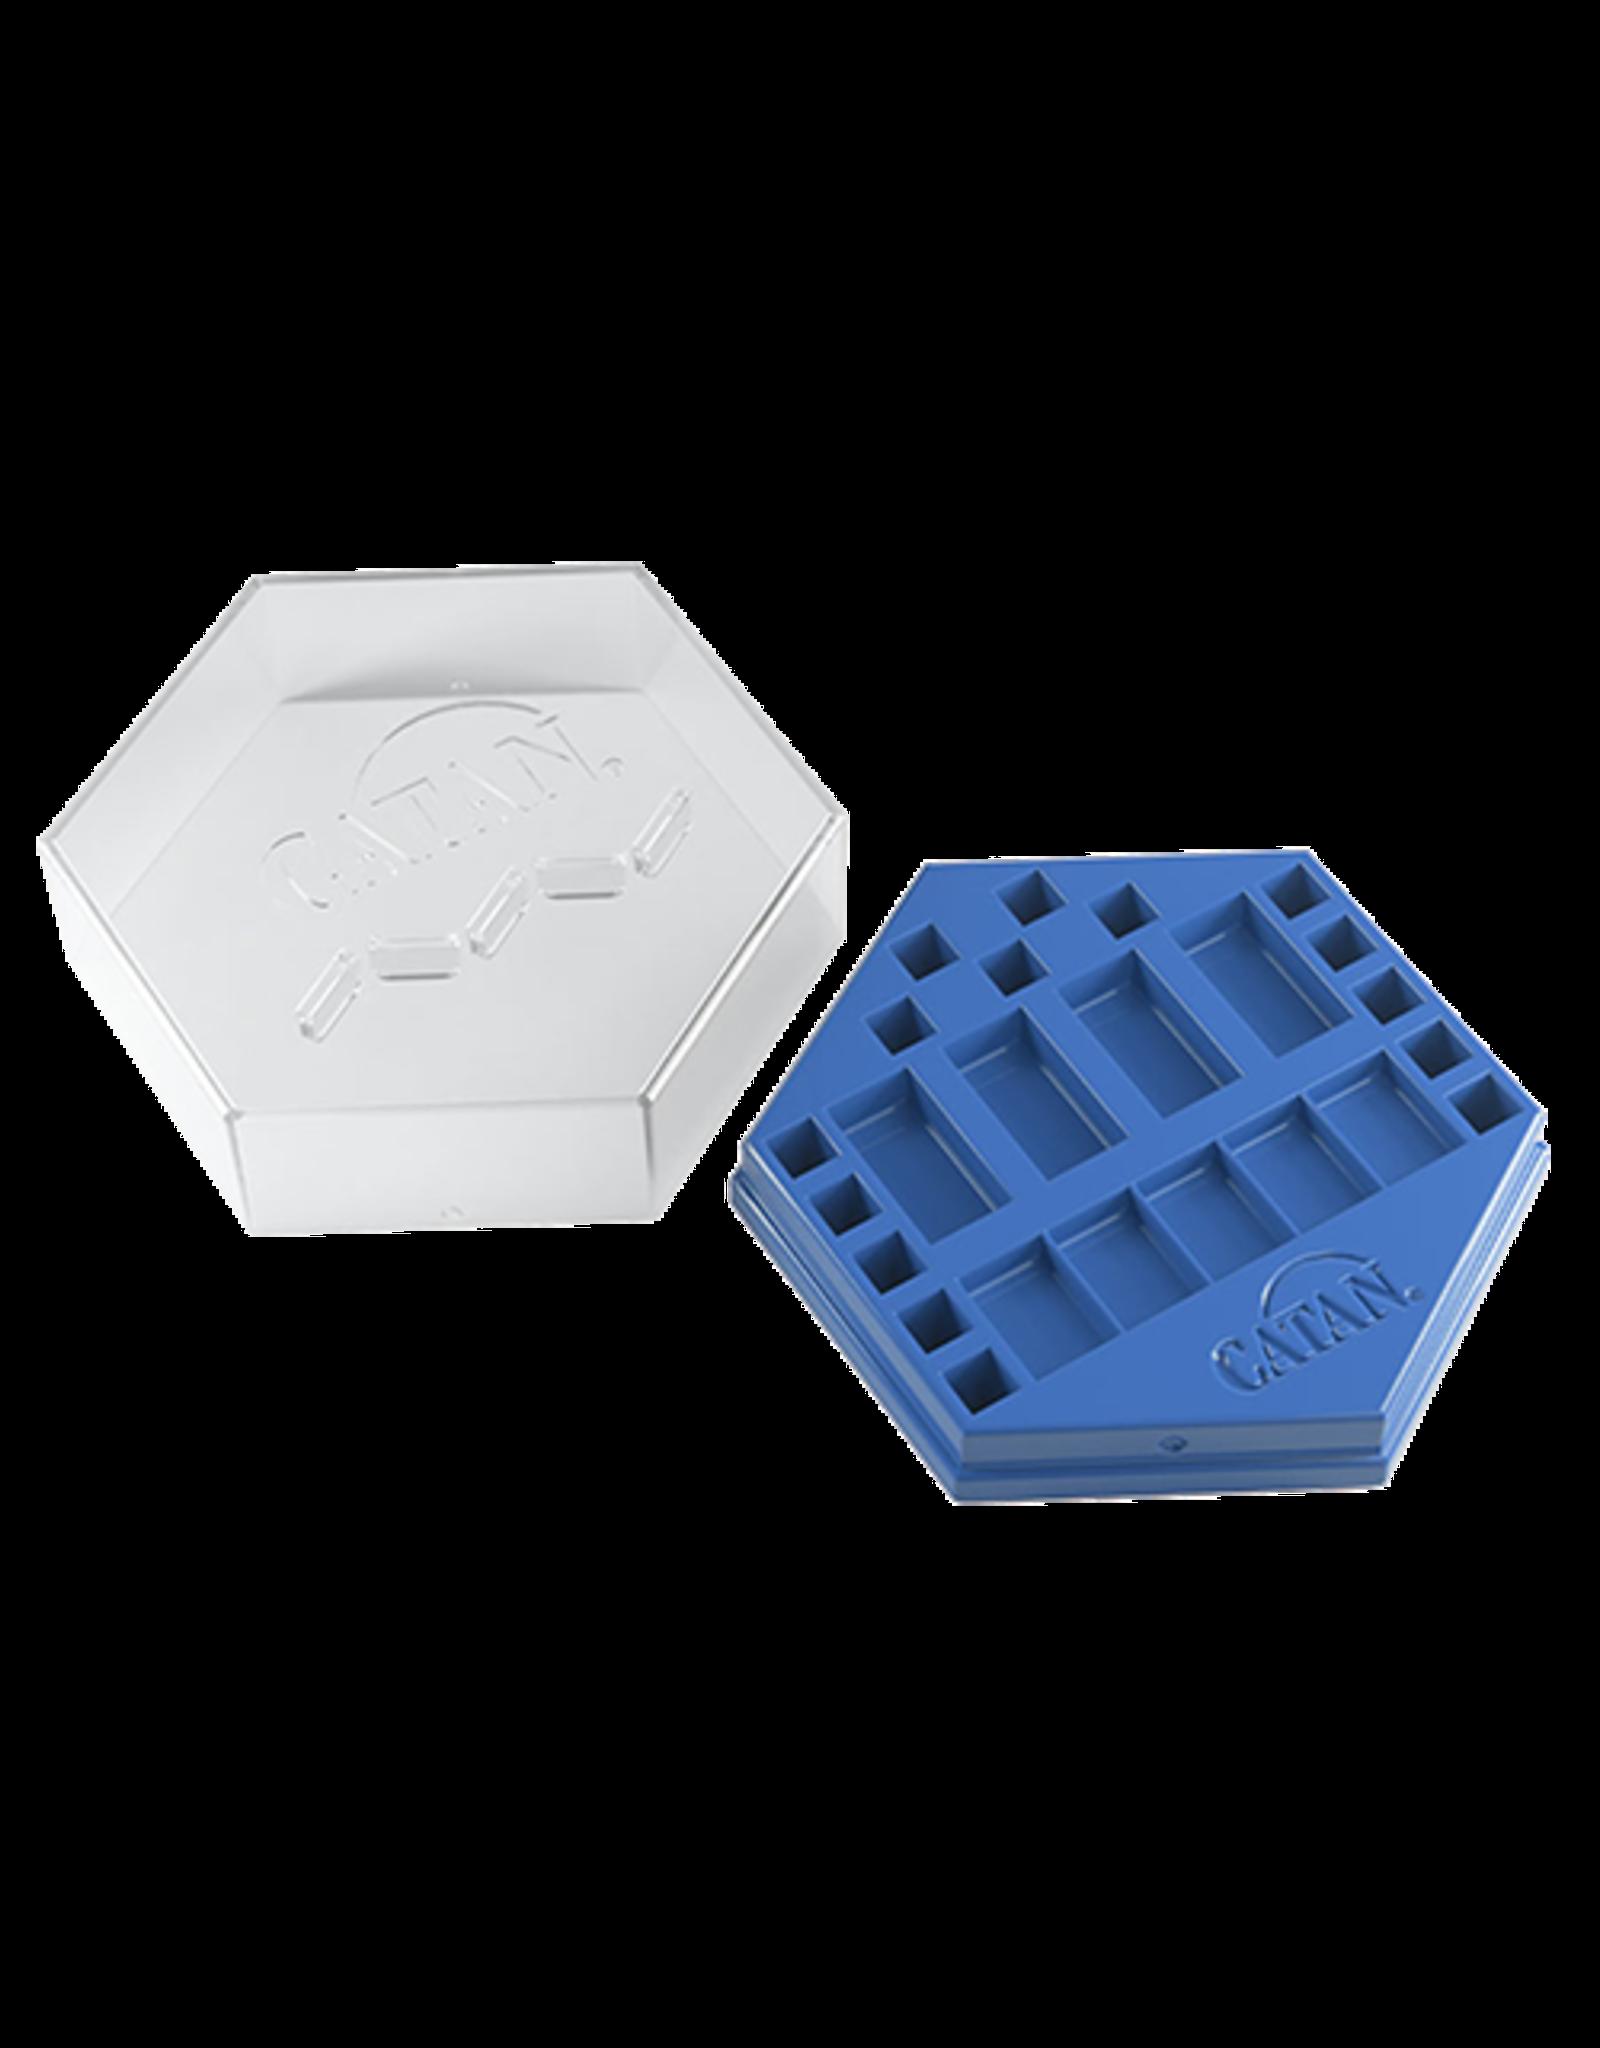 Catan Studio Catan Hexadocks Base Set